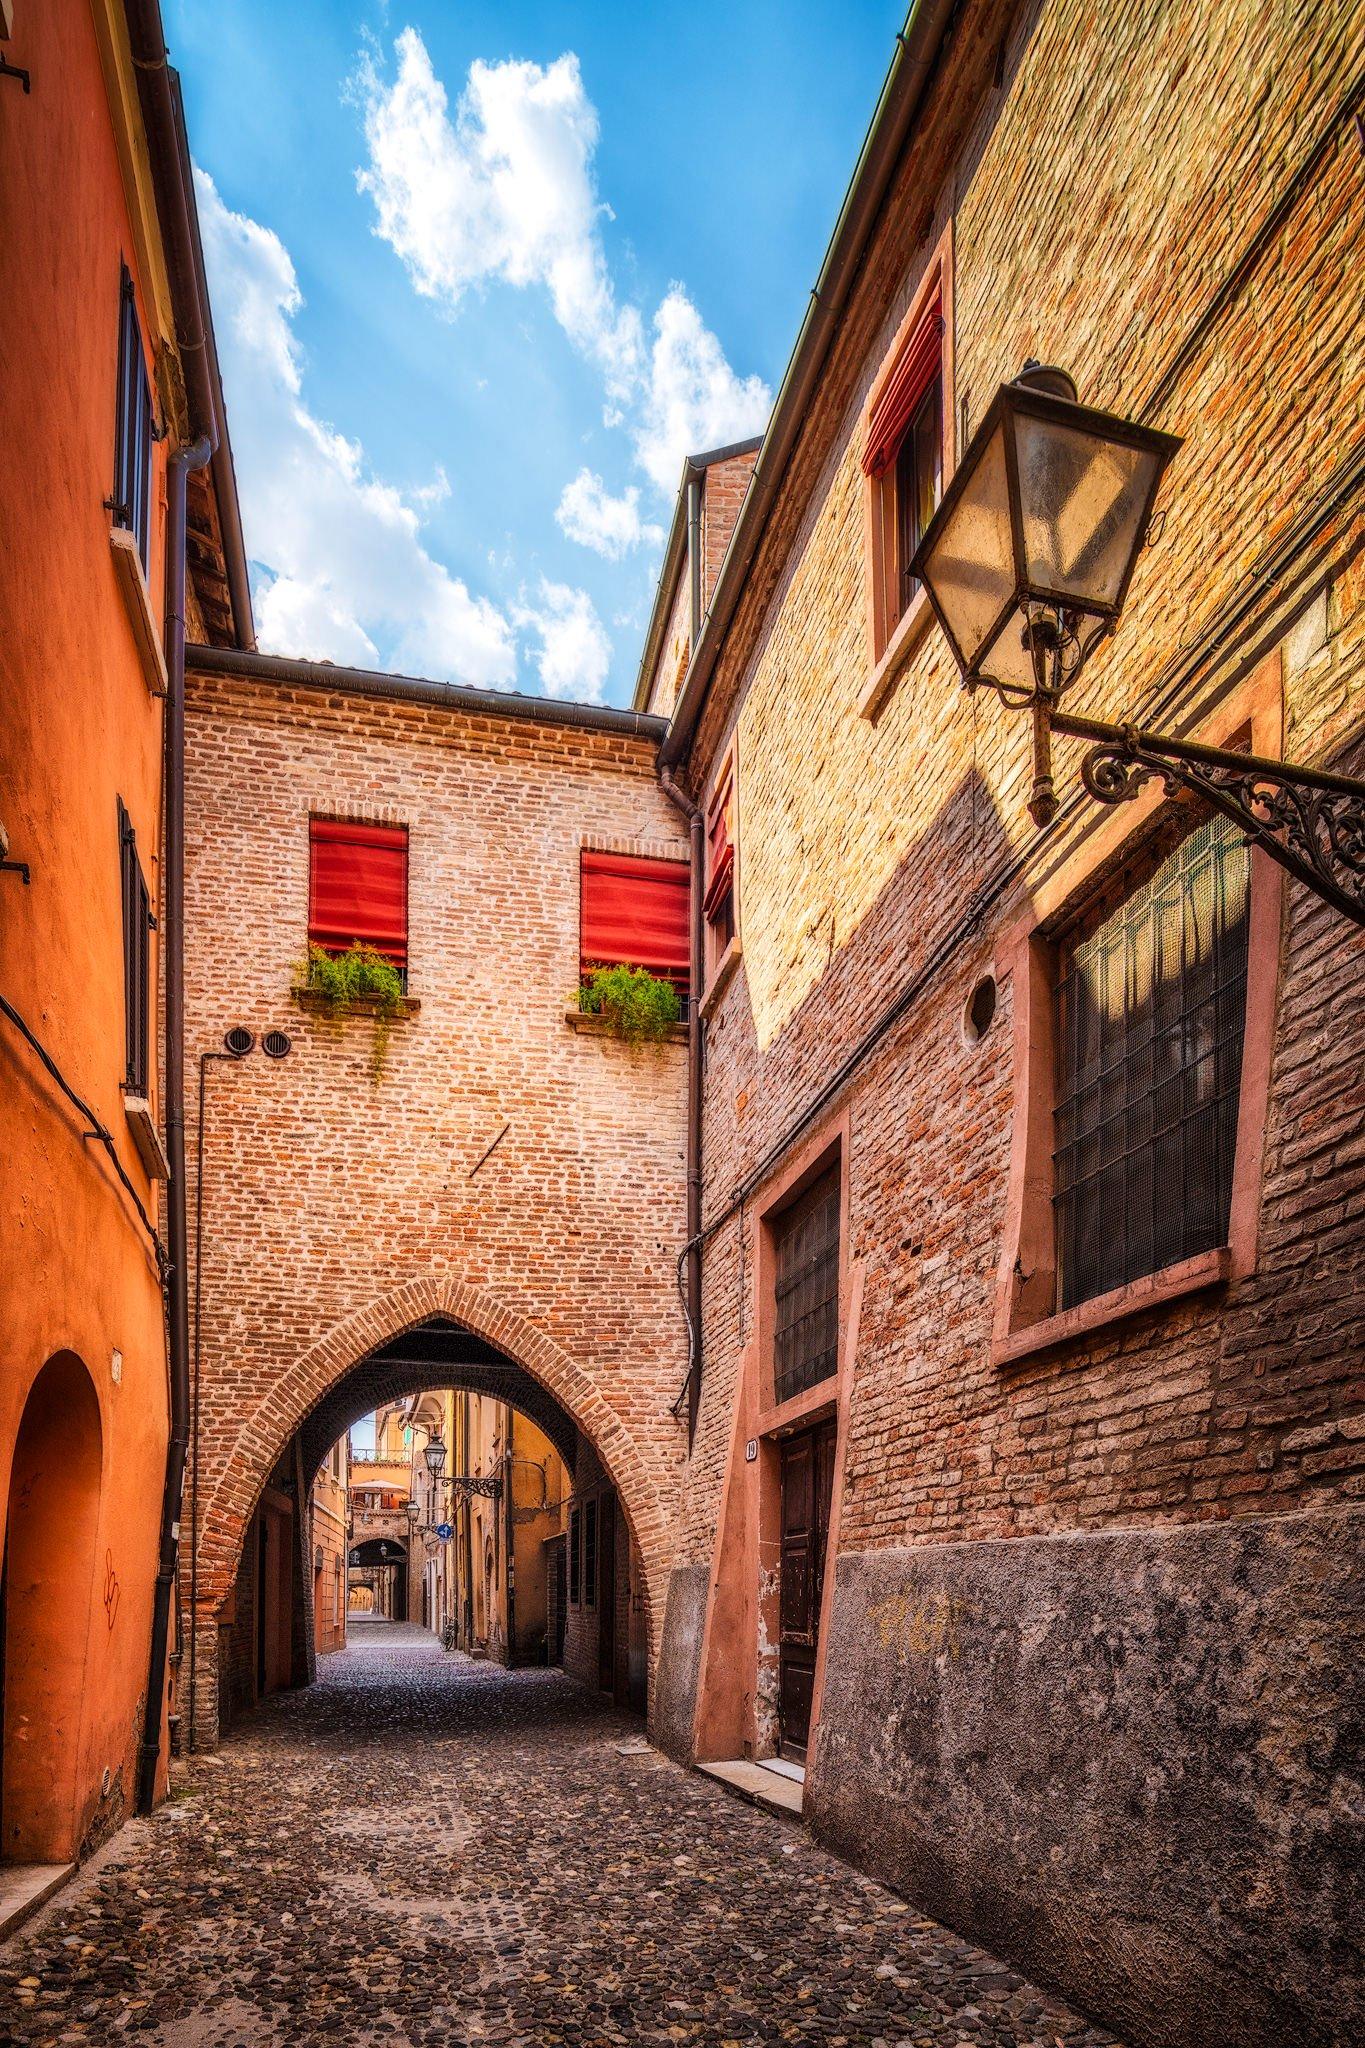 The medieval streets of Ferrara